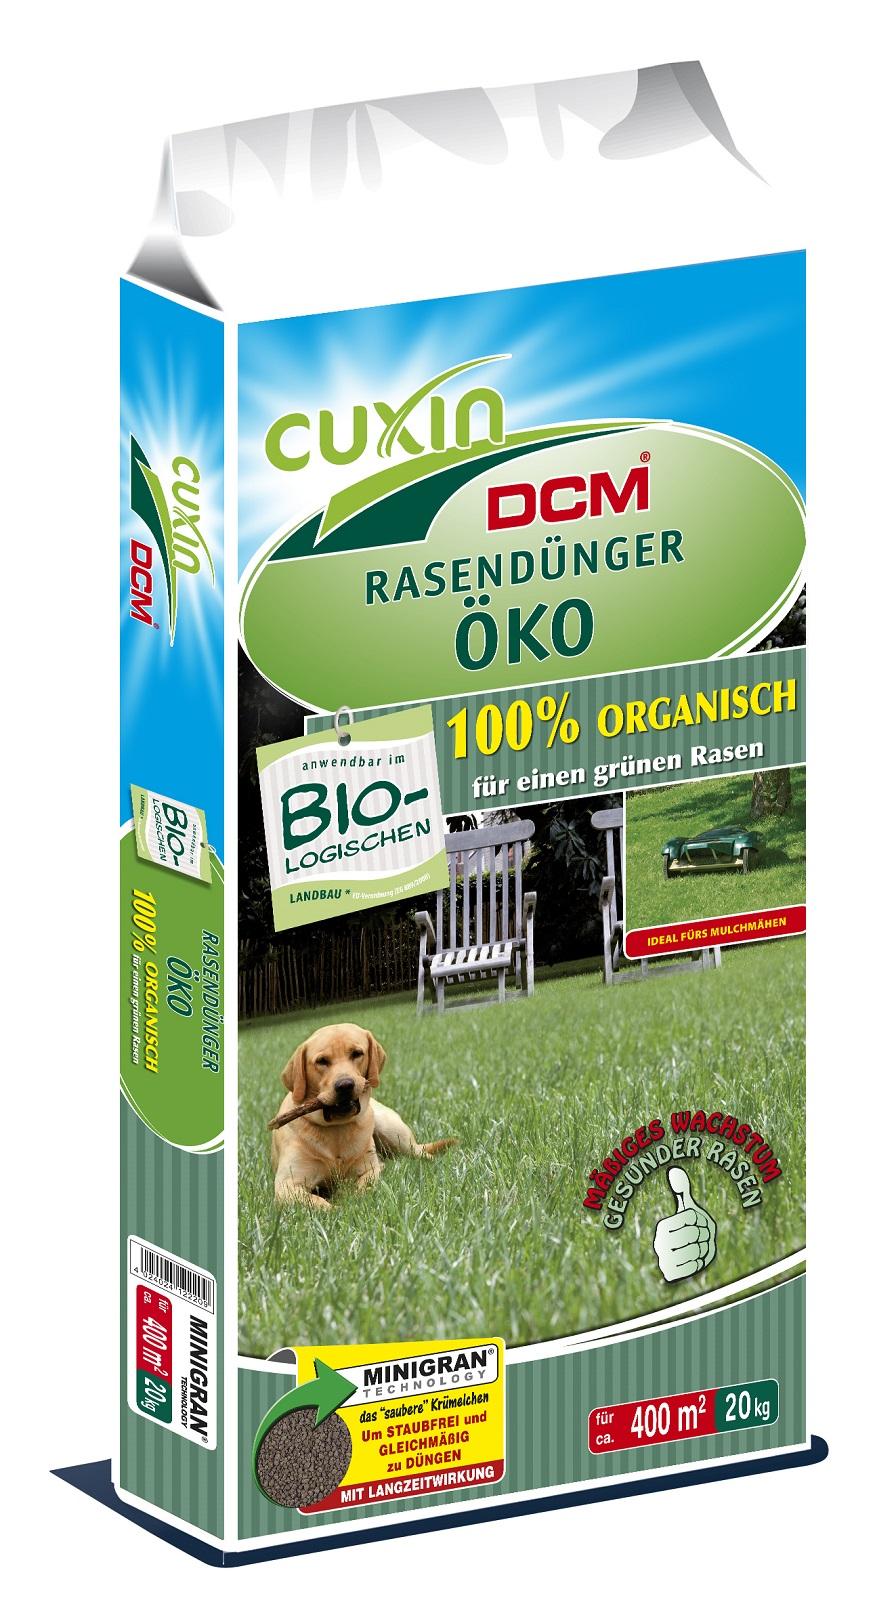 Cuxin Rasendünger ÖKO  20 kg Minigran